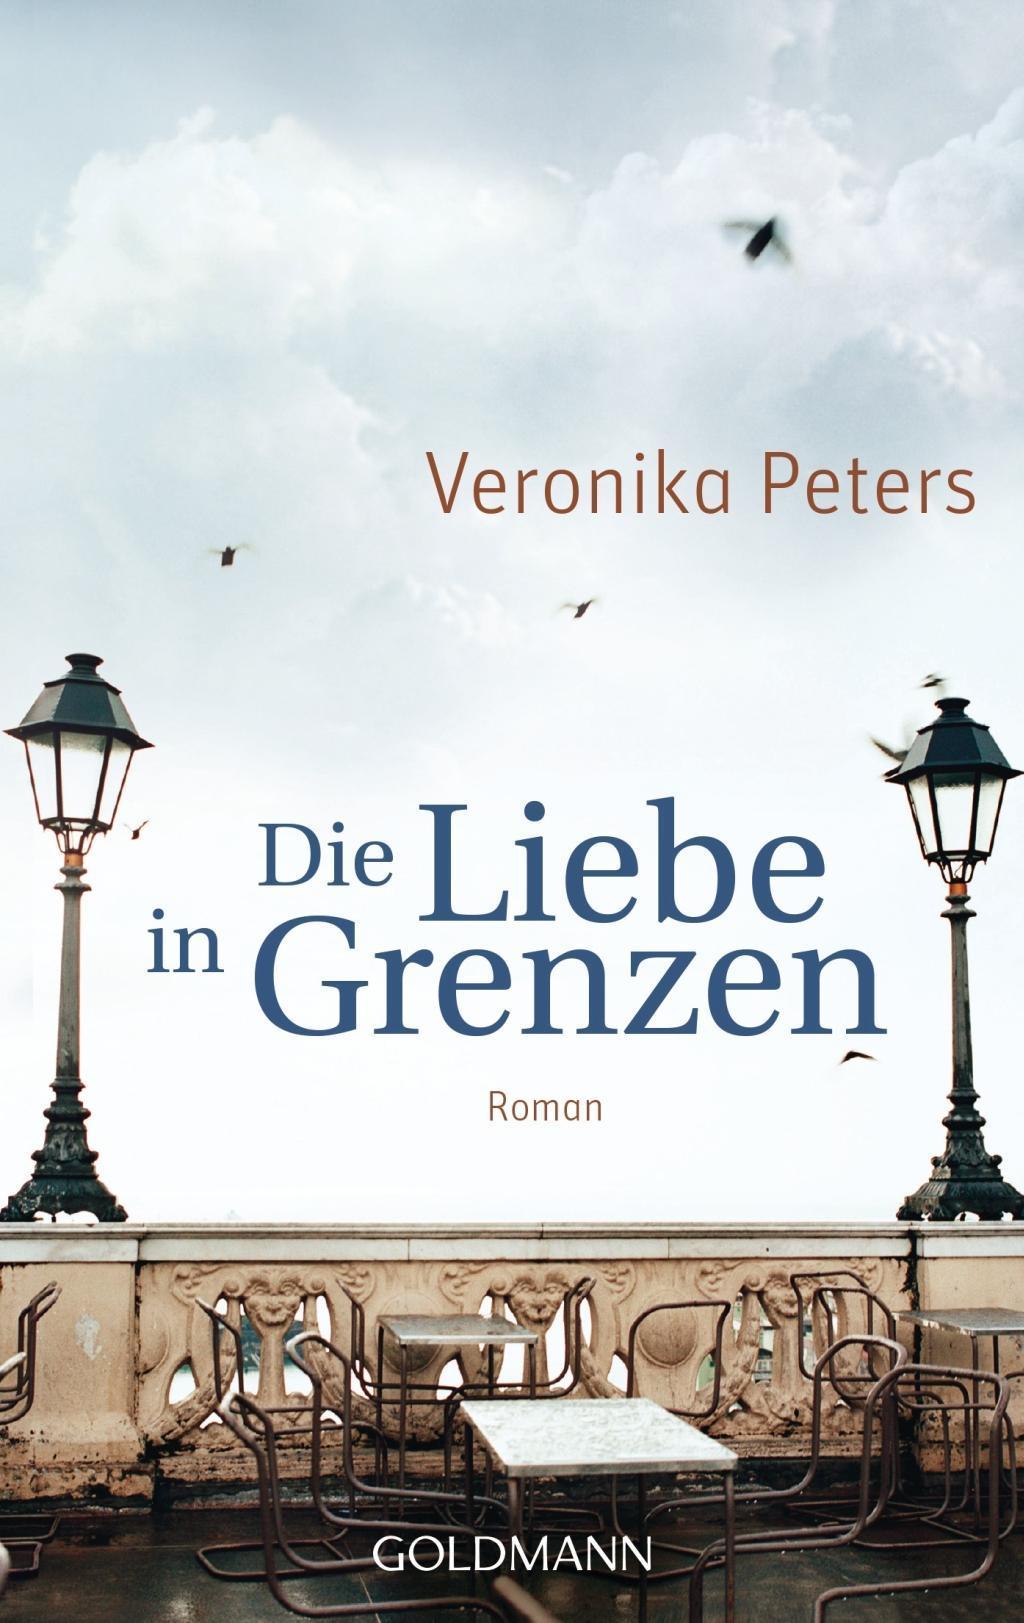 Die-Liebe-in-Grenzen-Veronika-Peters